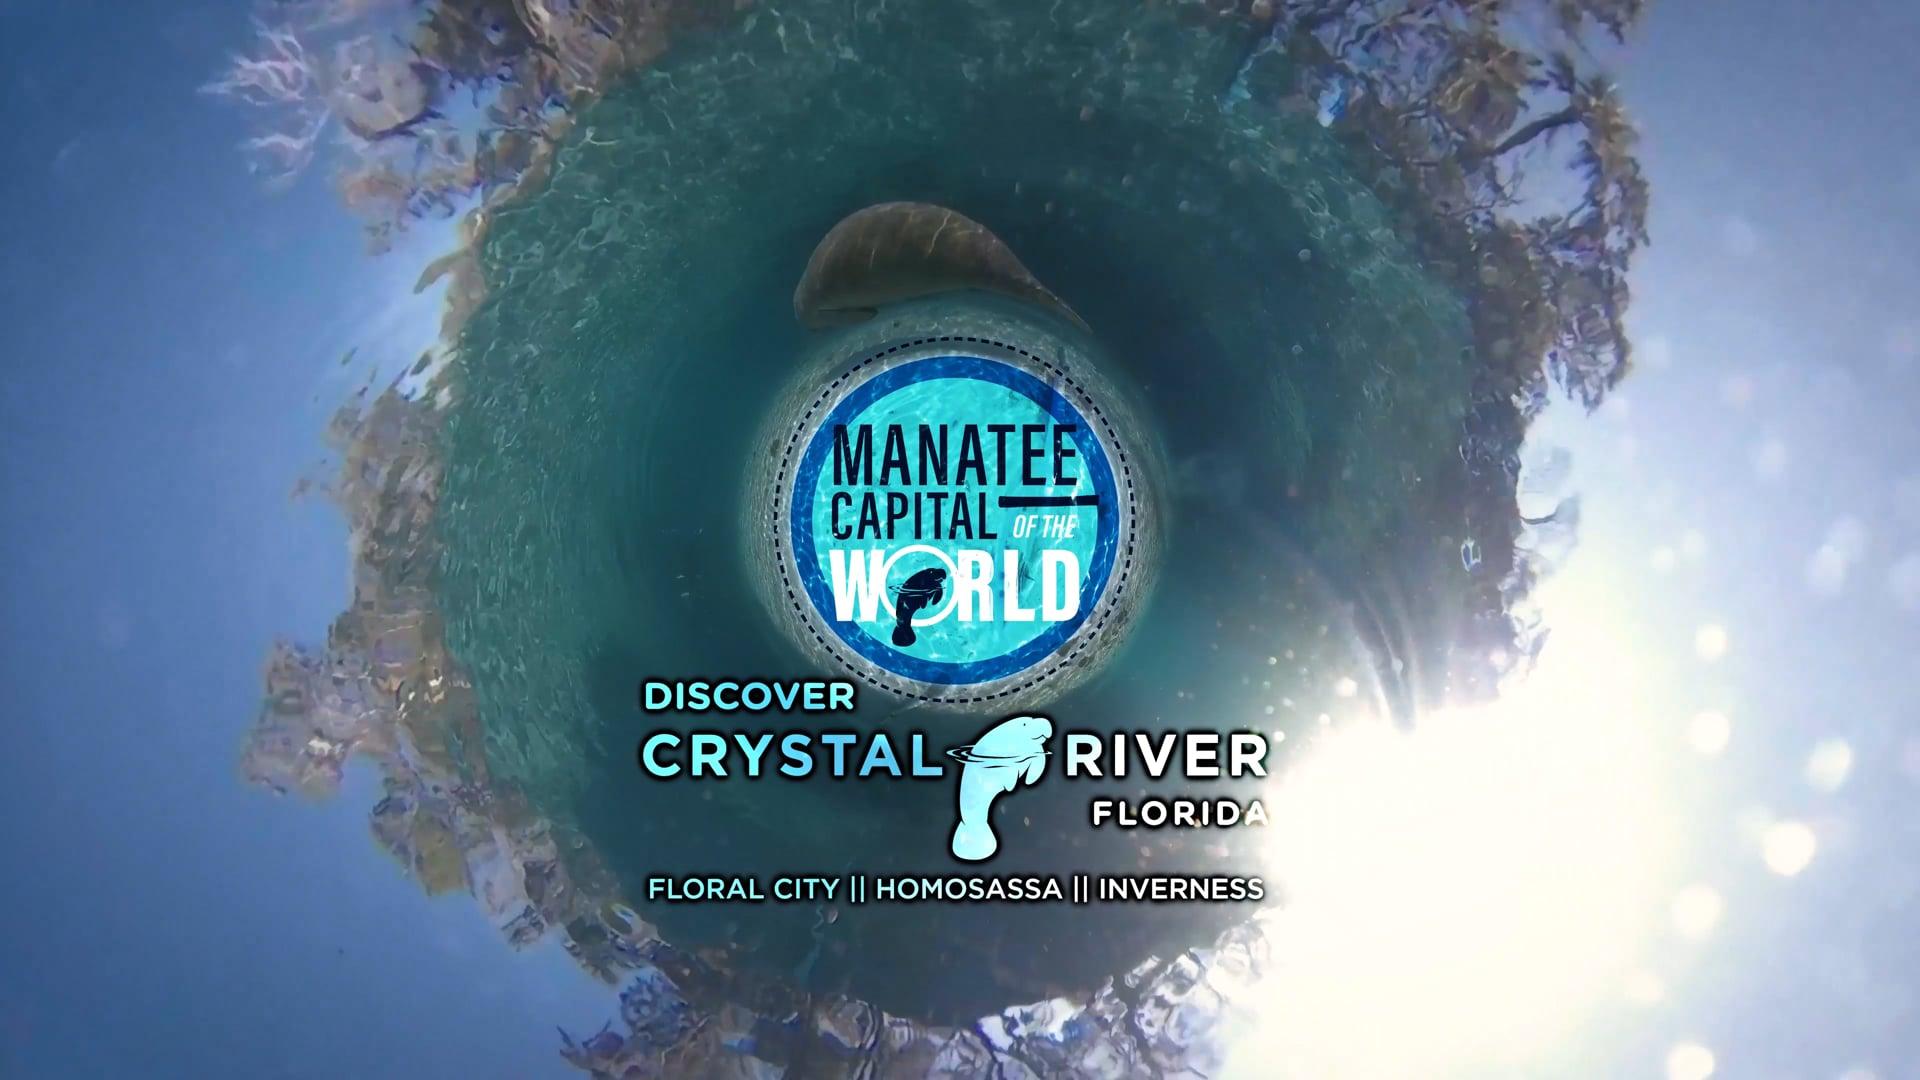 Discover Crystal River/Homosassa Florida (1 minute)